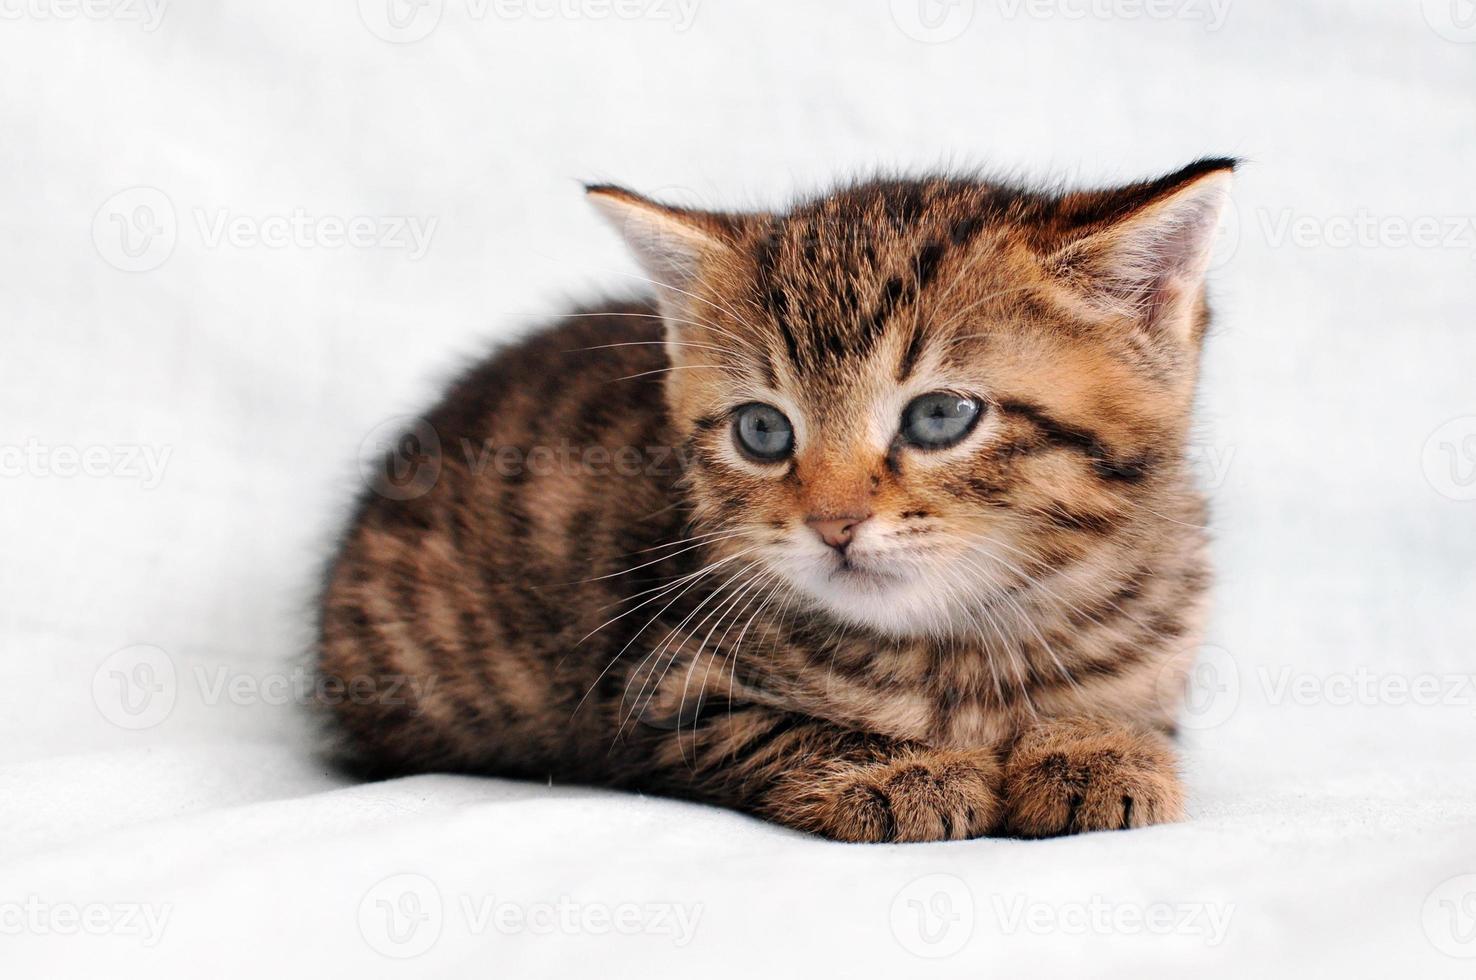 kattunge avkopplande foto